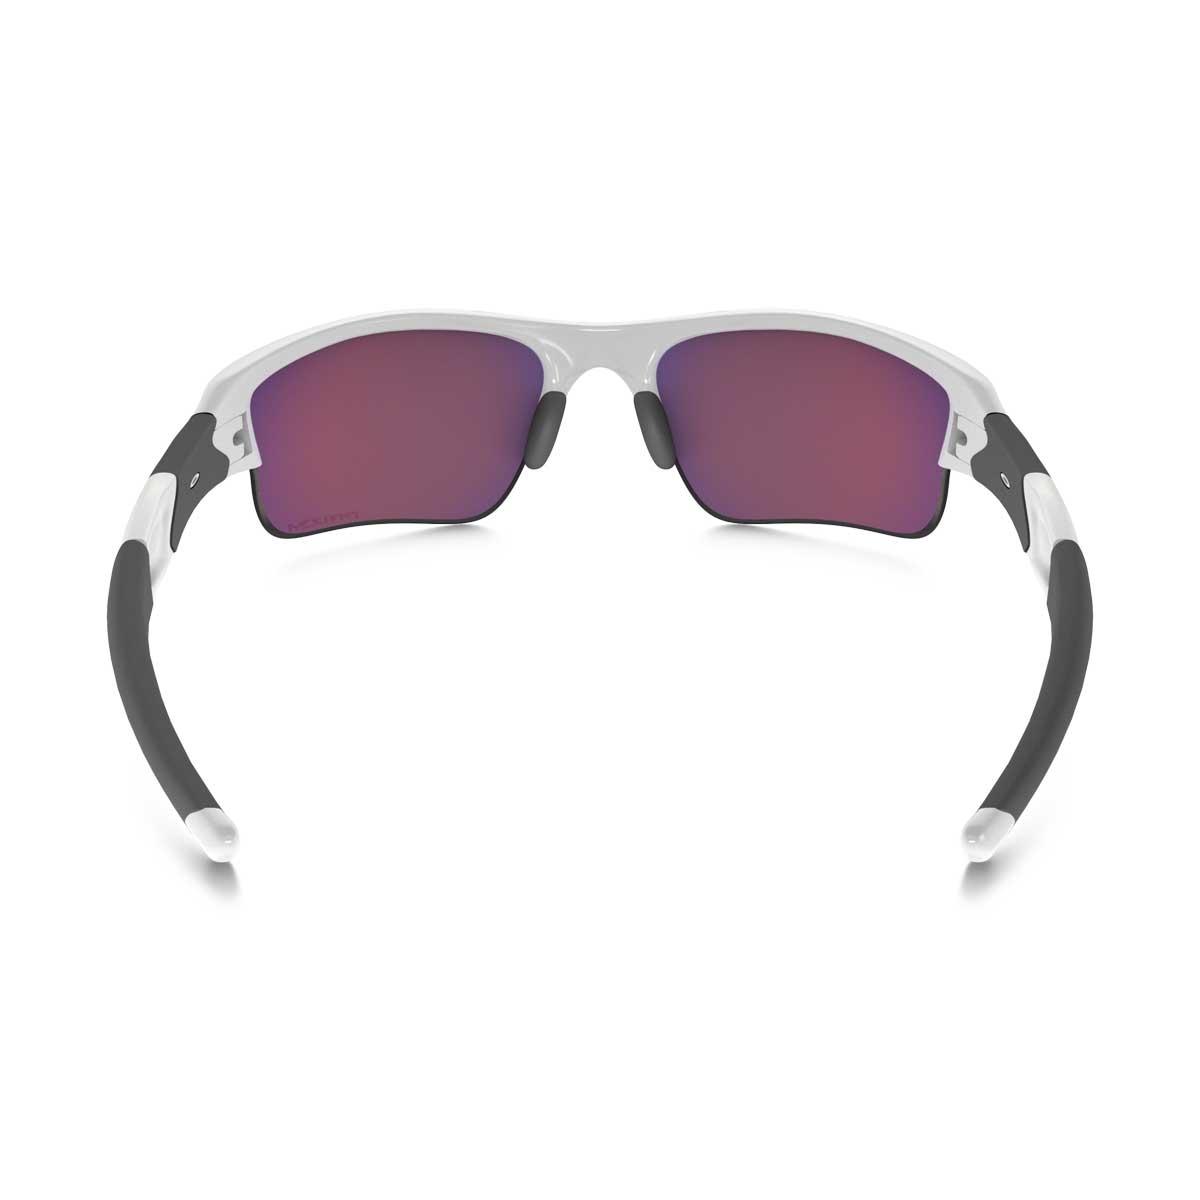 16920e6d0b ... Image of Oakley Flak Jacket XLJ Men s Polarized Sunglasses - Polished  White   Prizm Road ...